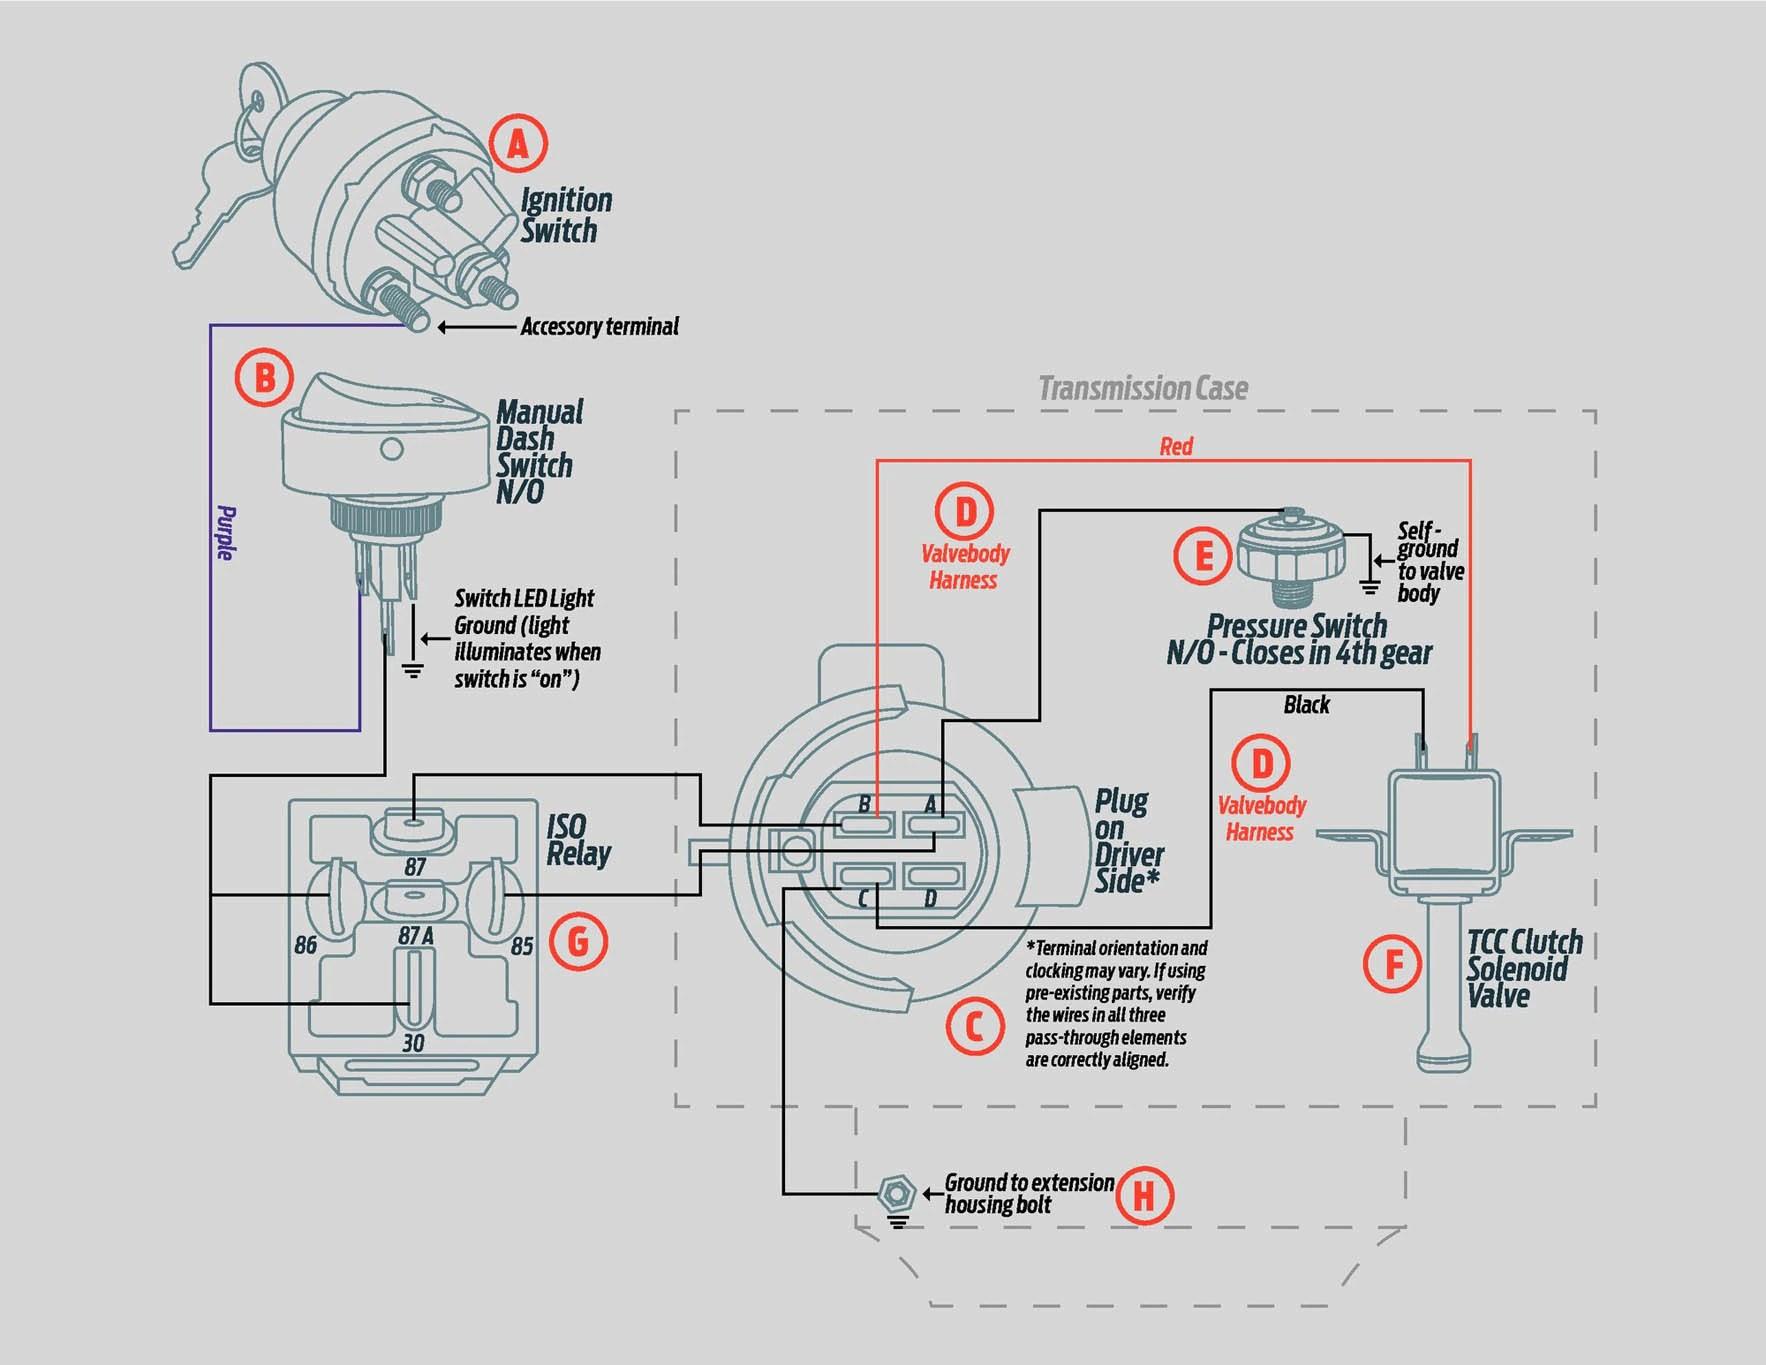 700r4 transmission wiring diagram no computer